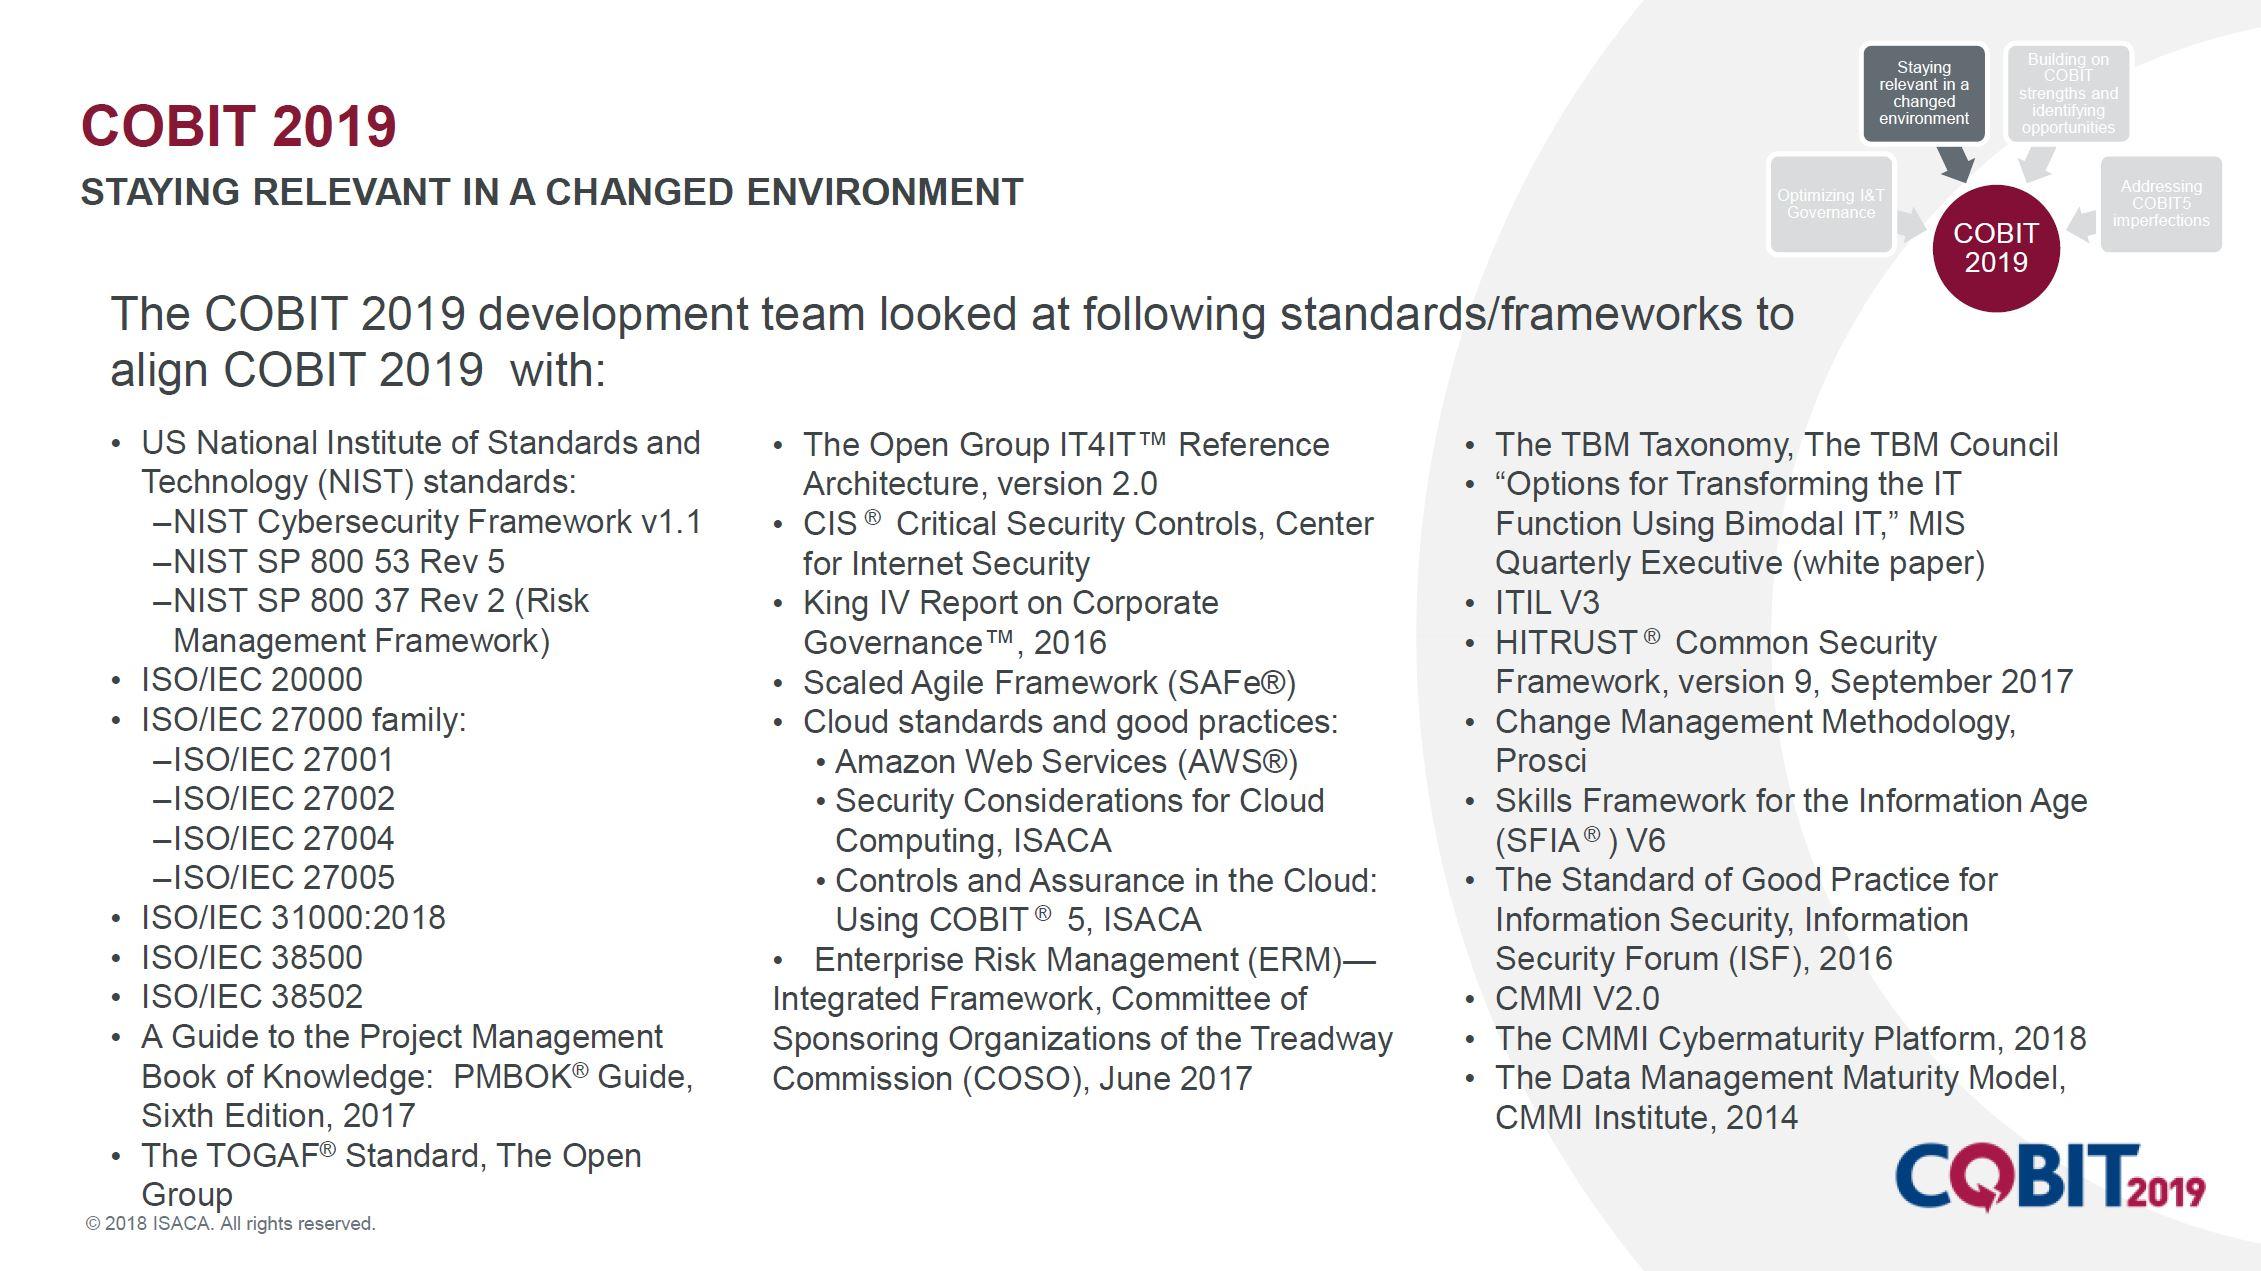 COBIT 2019 Standards